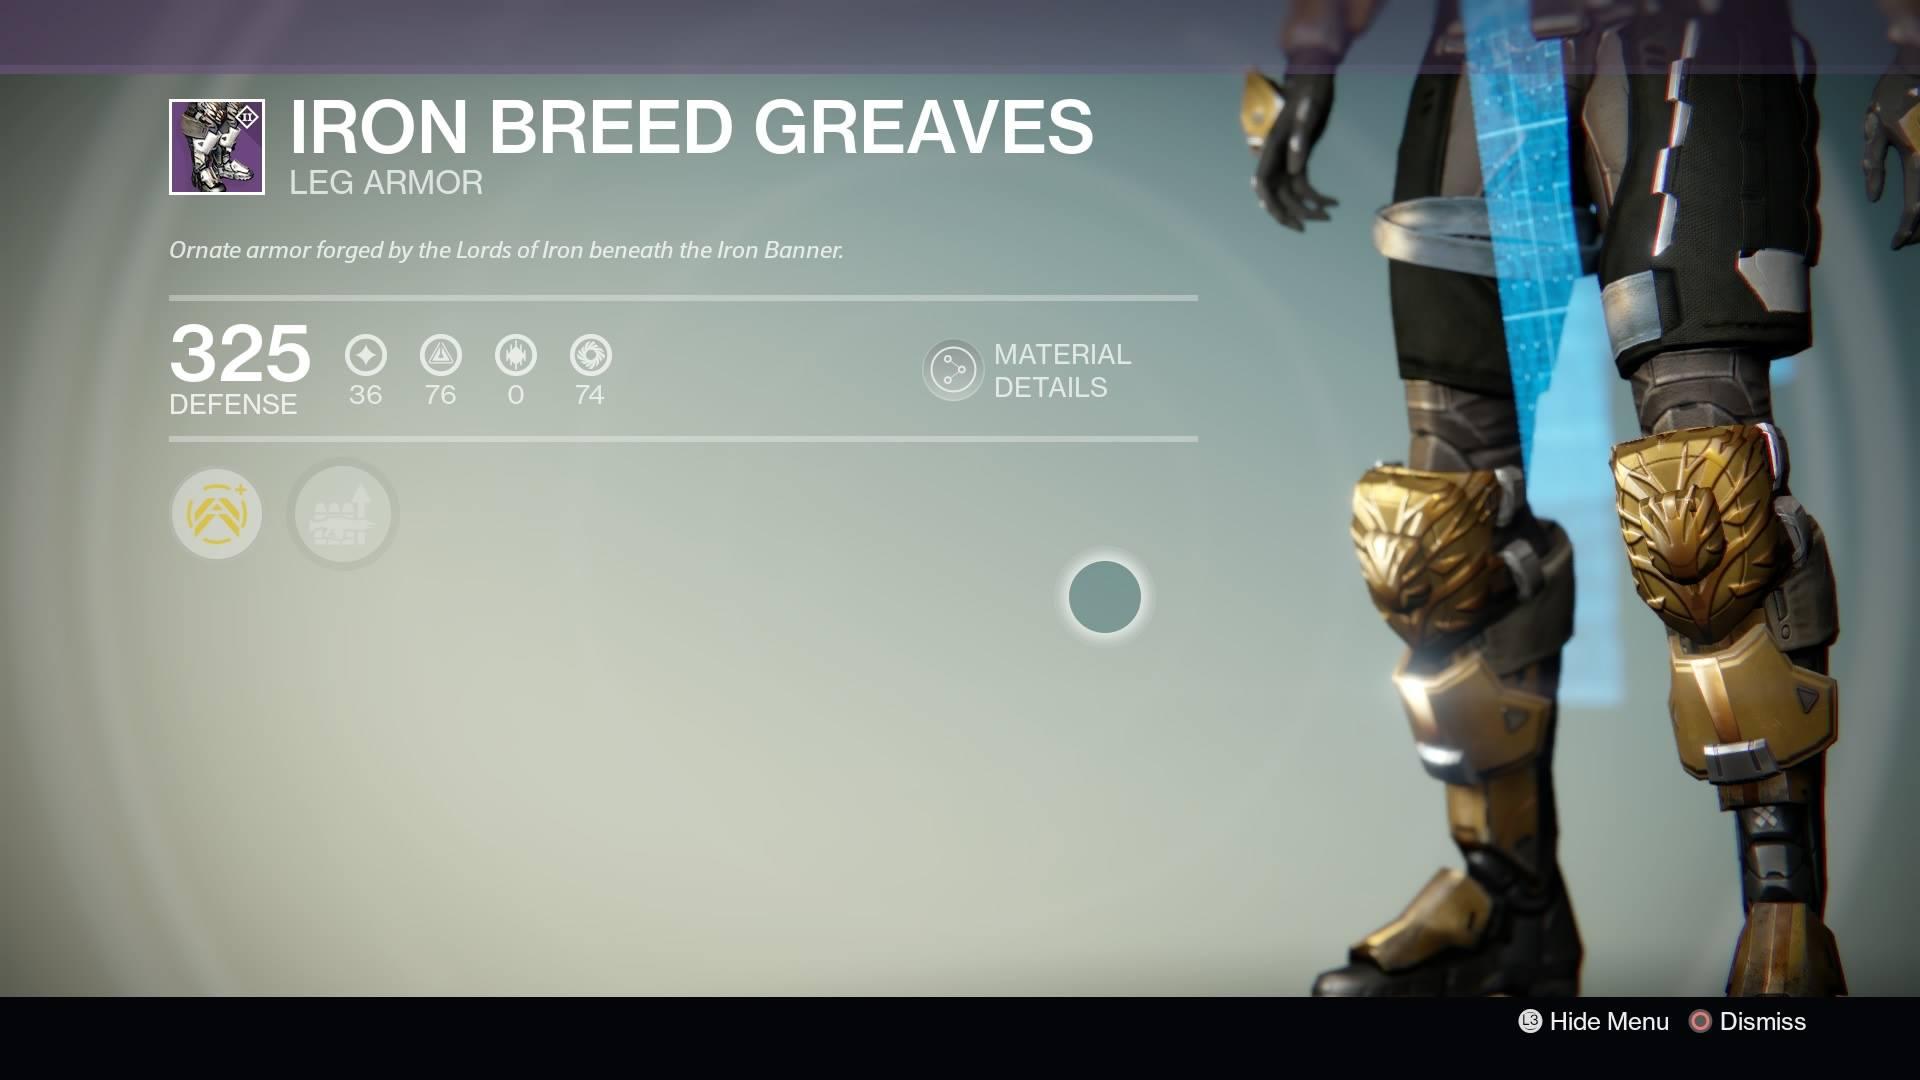 Destiny - Titan Iron Breed Greaves